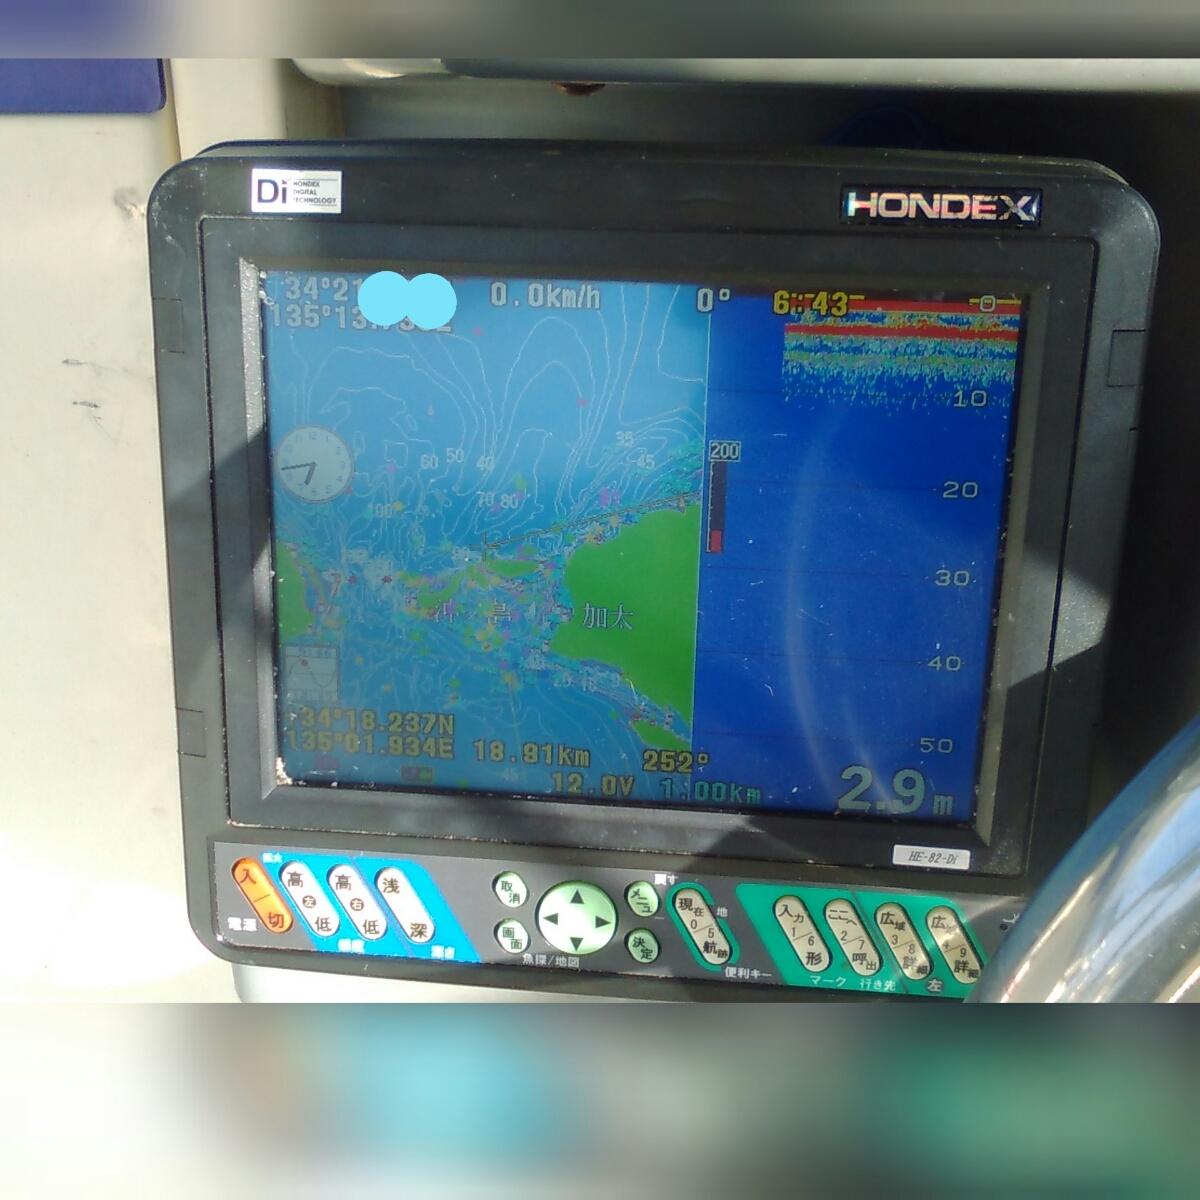 FC23 ヤマハ4スト115馬力 GPS漁探付き 定員10名 【個人出品】大阪府南部_画像6